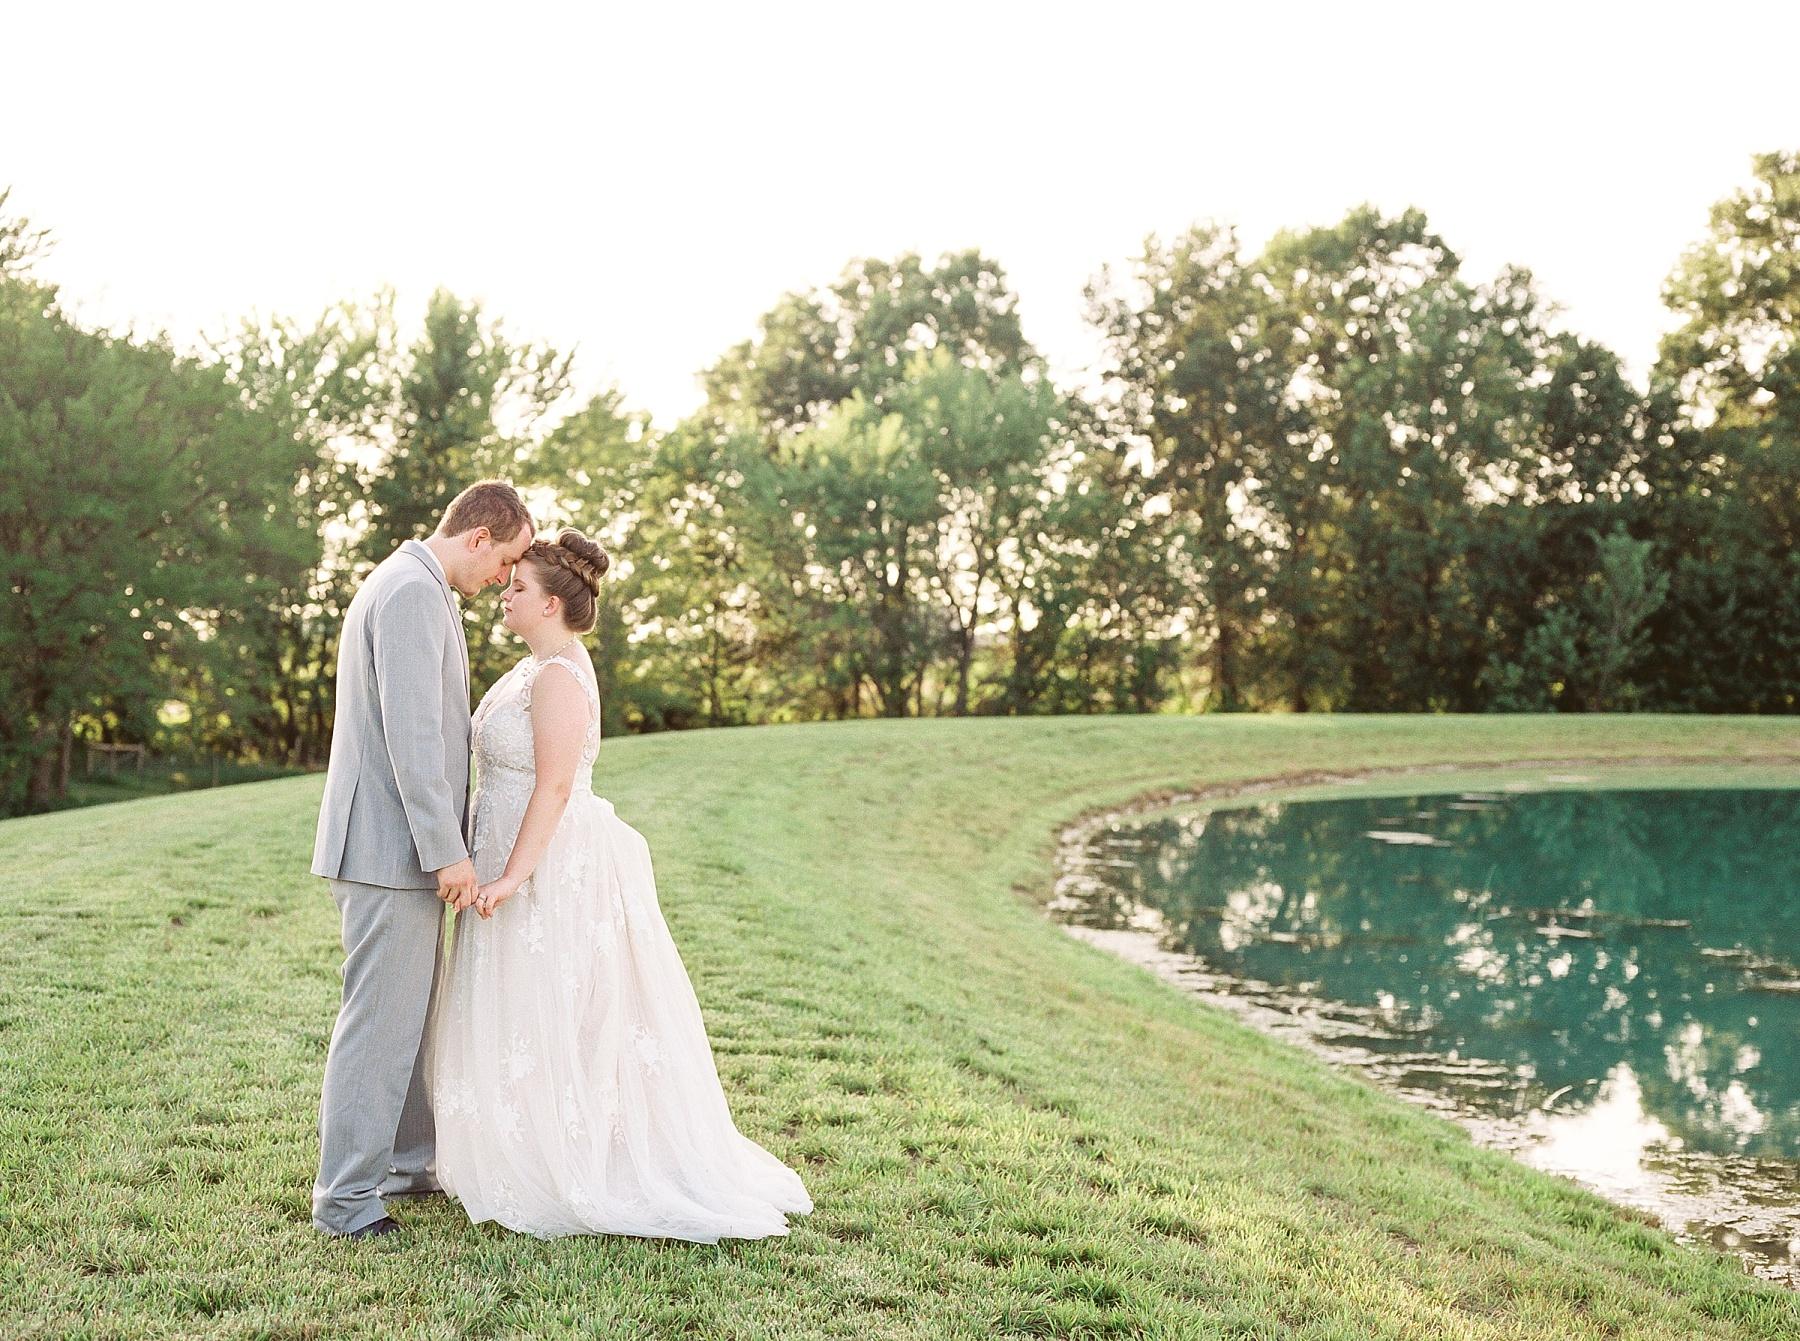 Intimate Summer Wedding at Emerson Fields by Kelsi Kliethermes Photography Best Missouri and Maui Wedding Photographer_0011.jpg